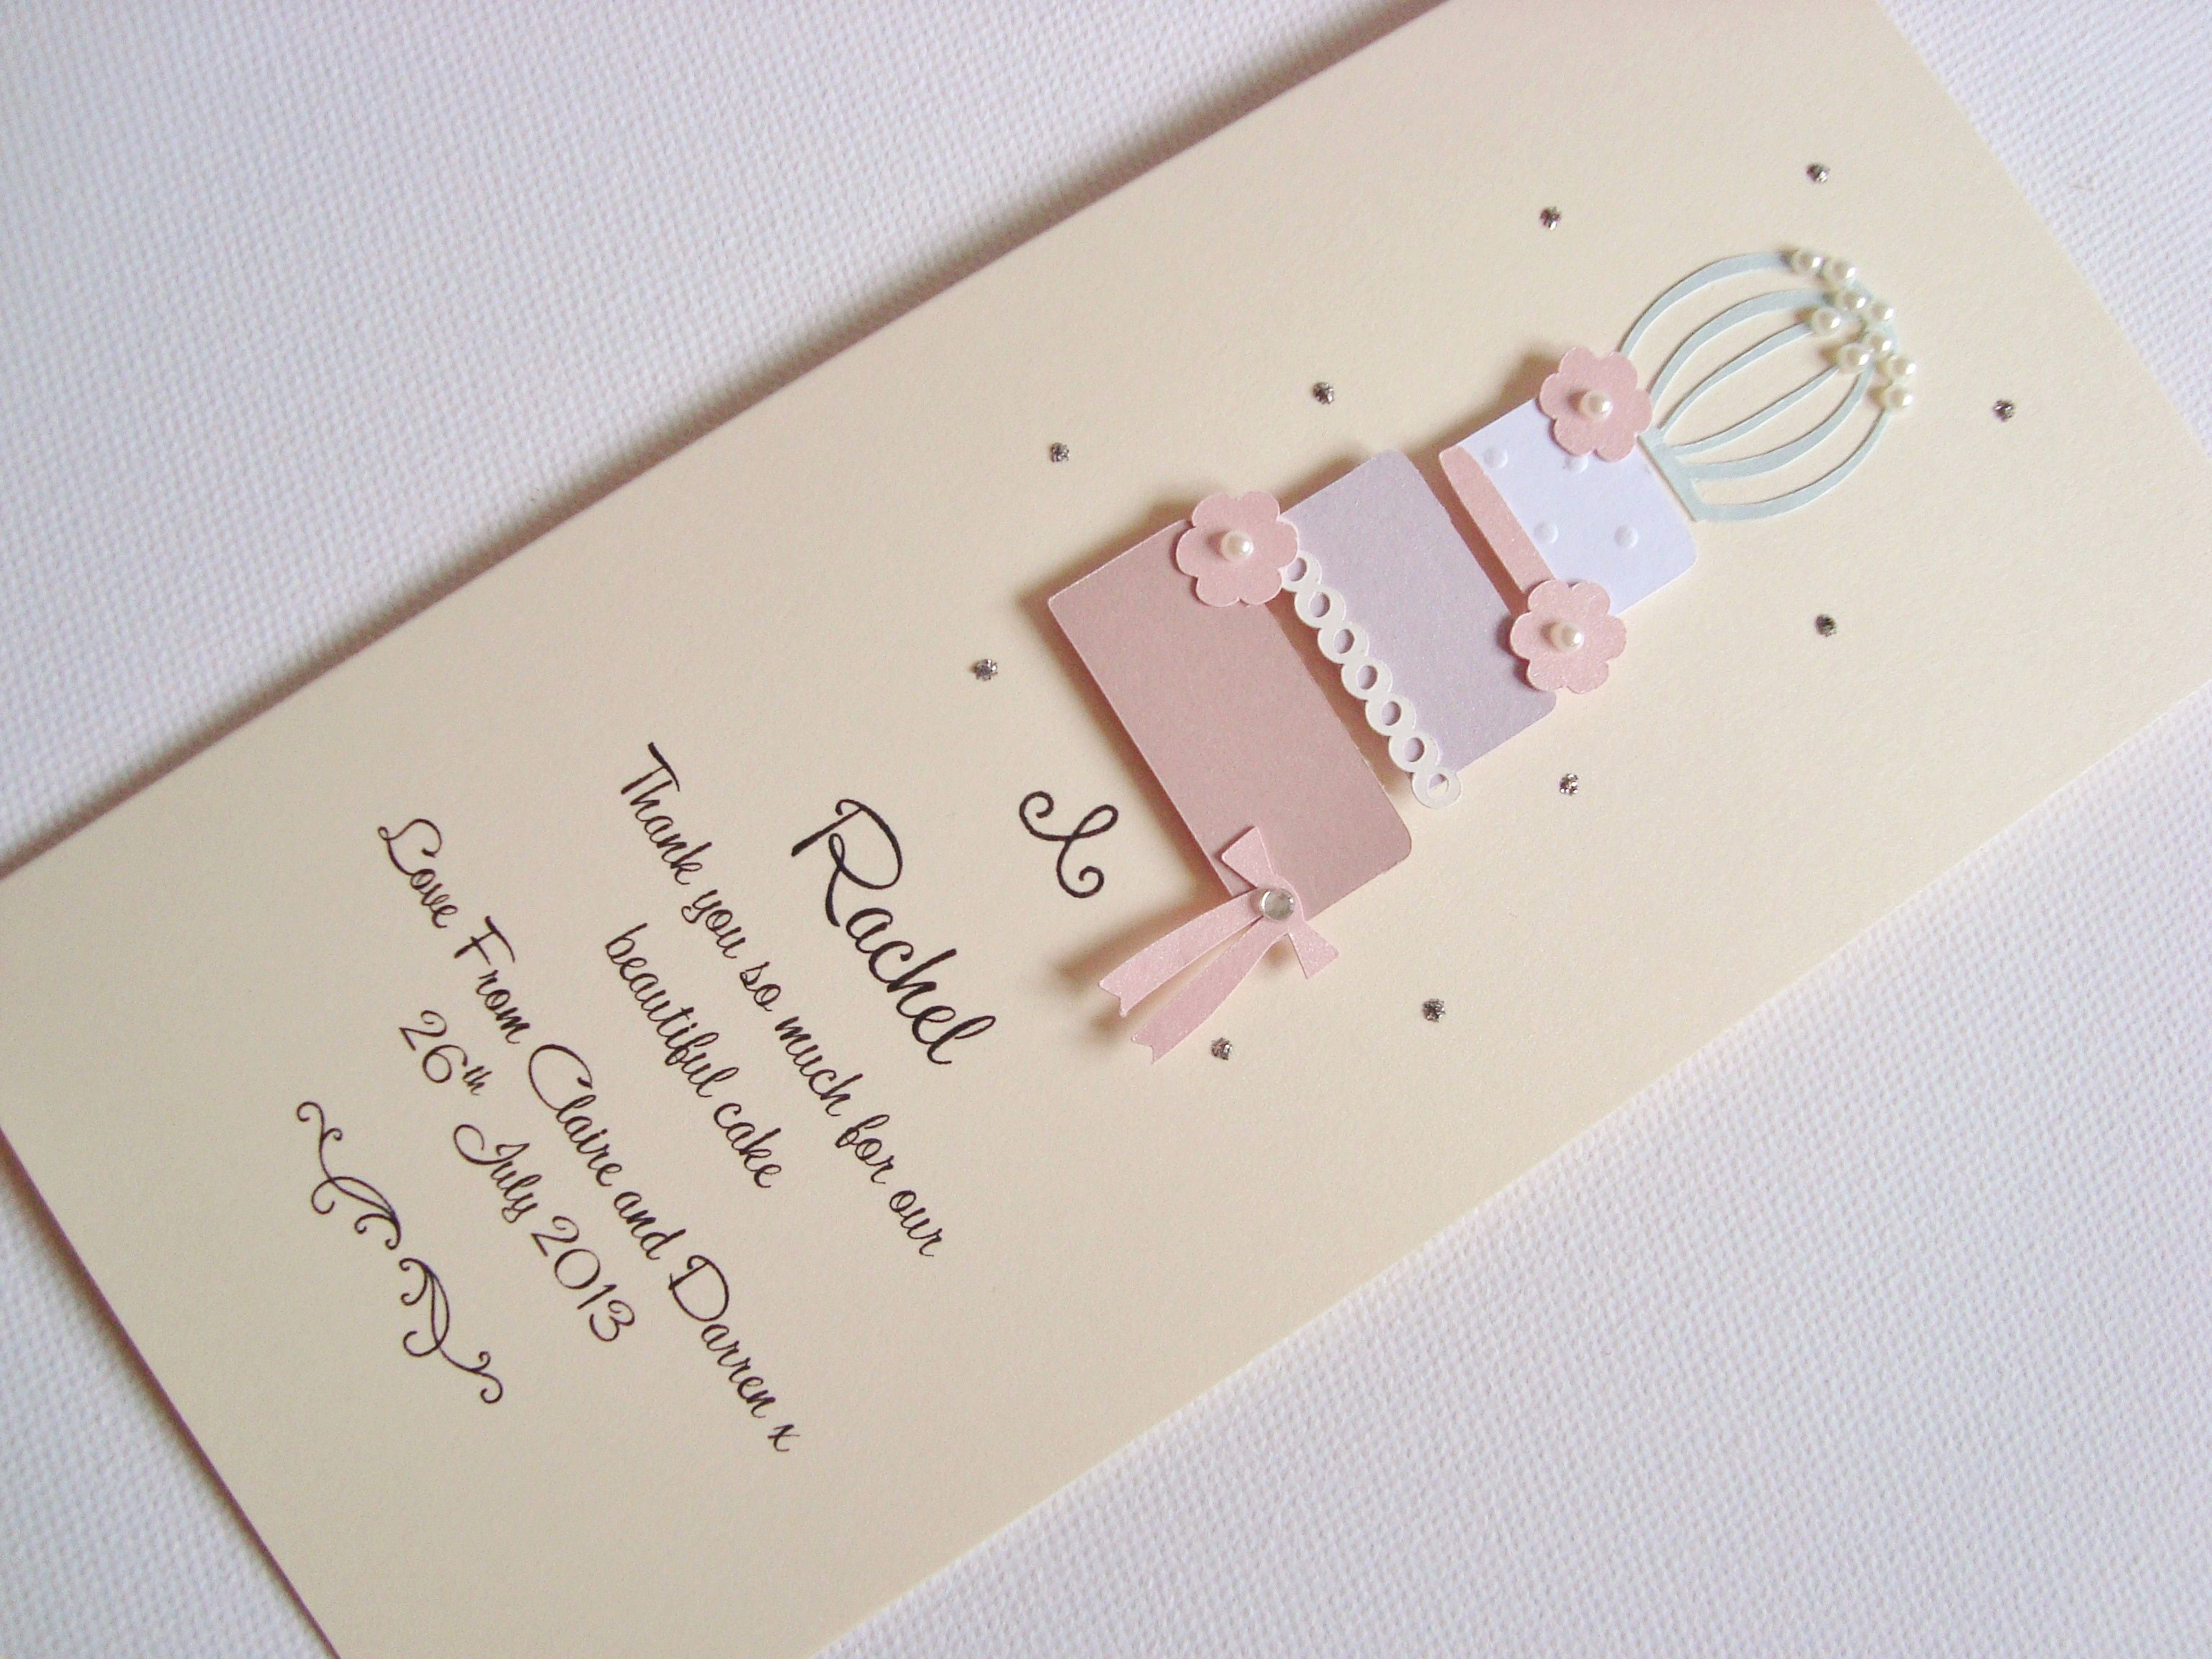 birdcage wedding invitation template%0A Birdcage Wedding Cake Thank You Card www ohsopurrfect co uk